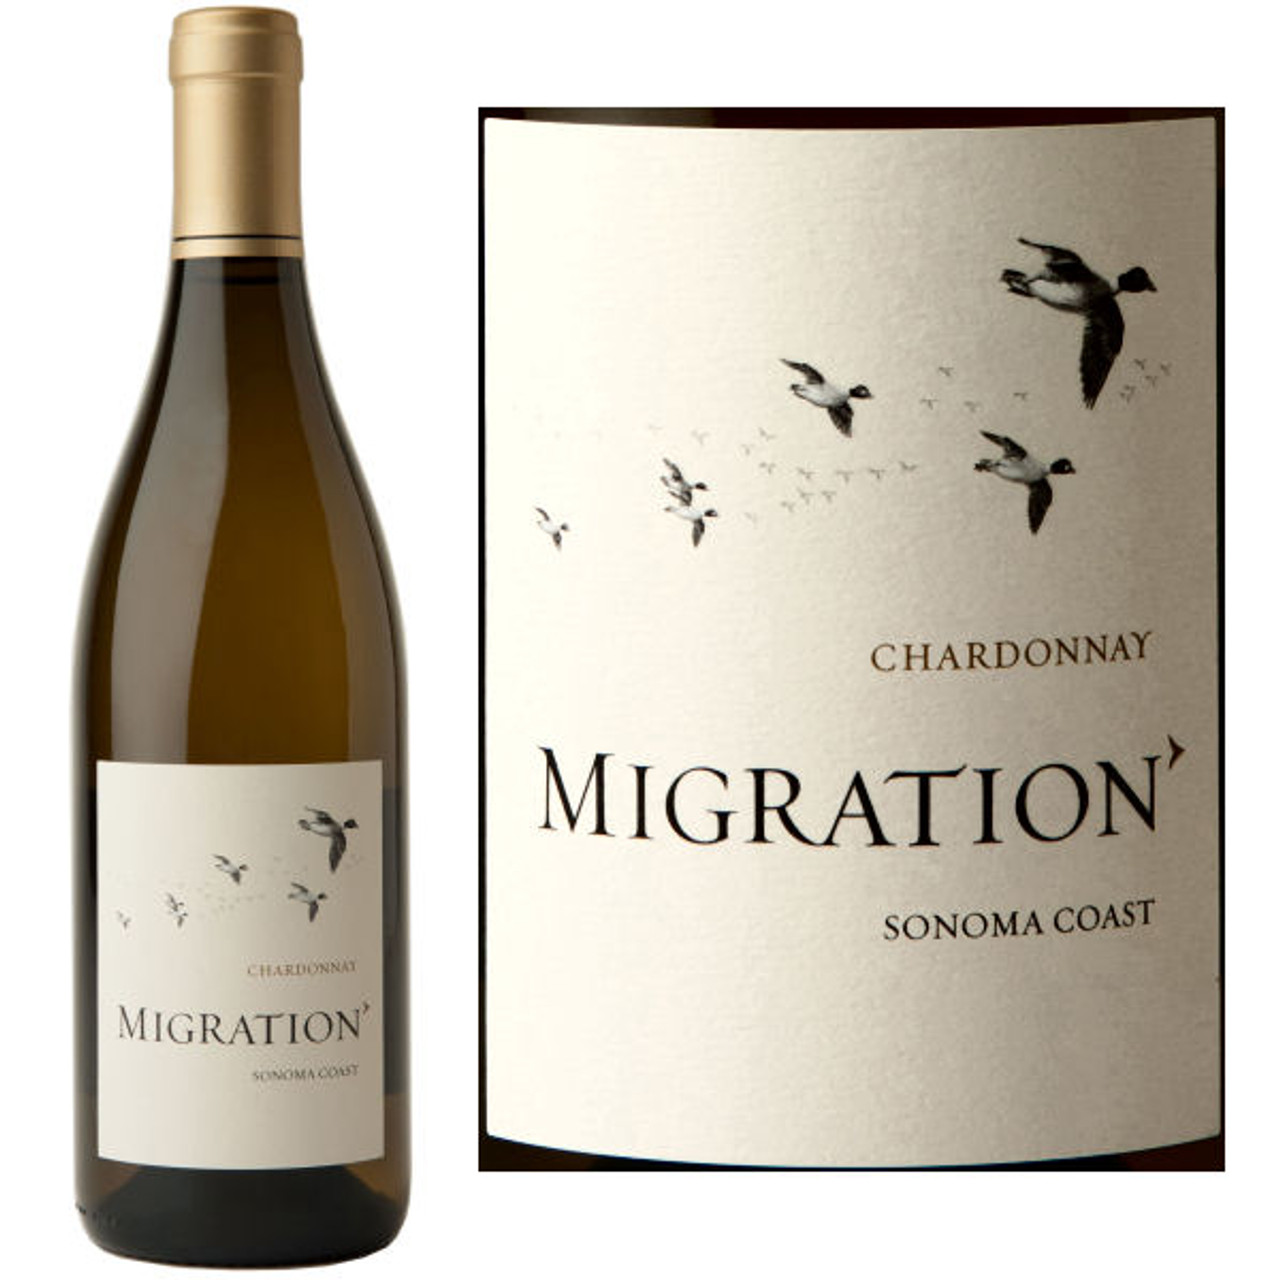 Migration by Duckhorn Sonoma Coast Chardonnay